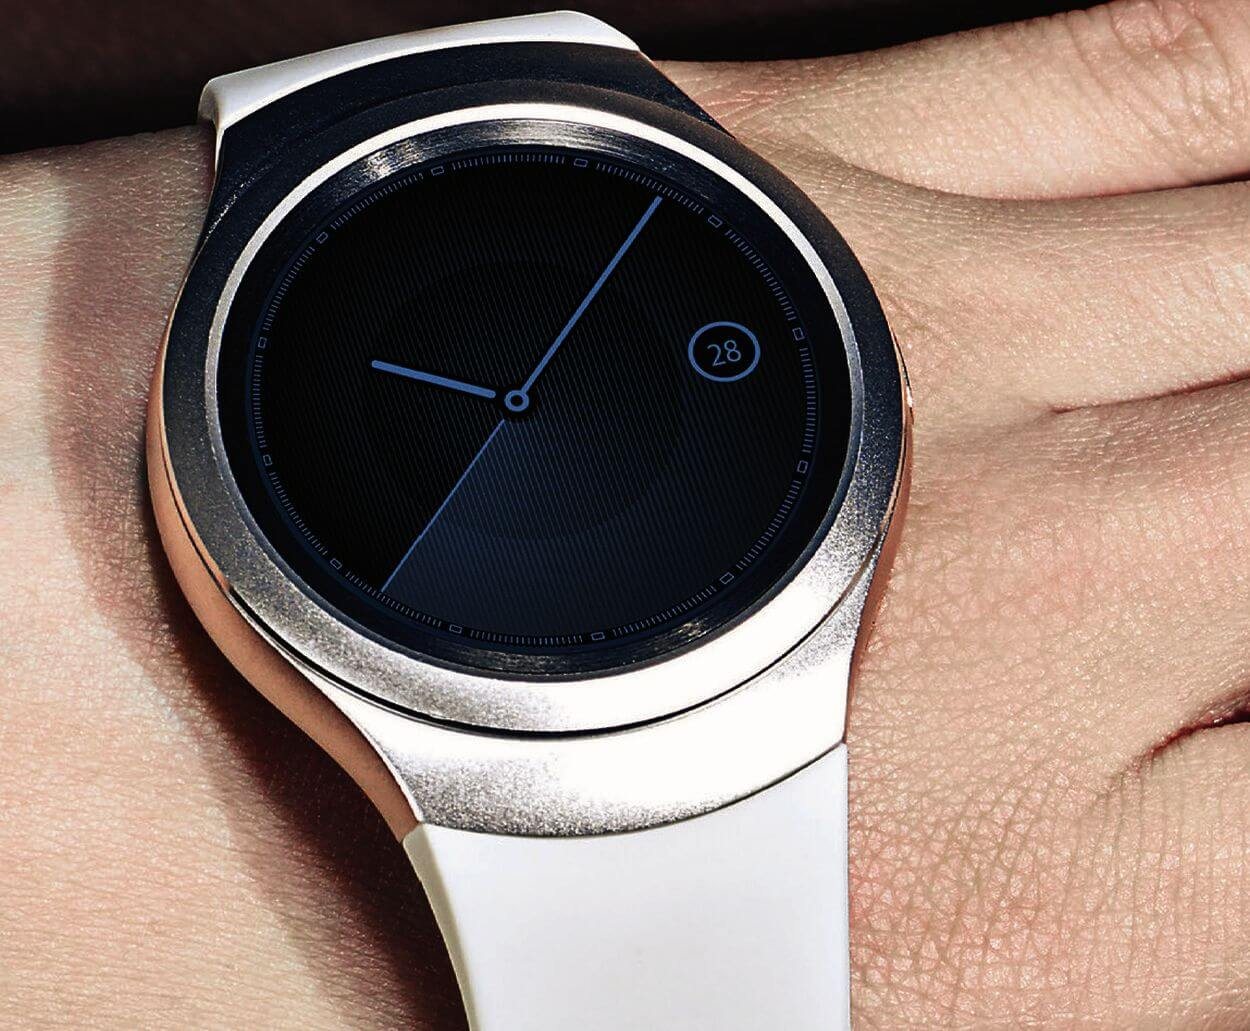 Samsung galaxy gear s2 smartwatch 34